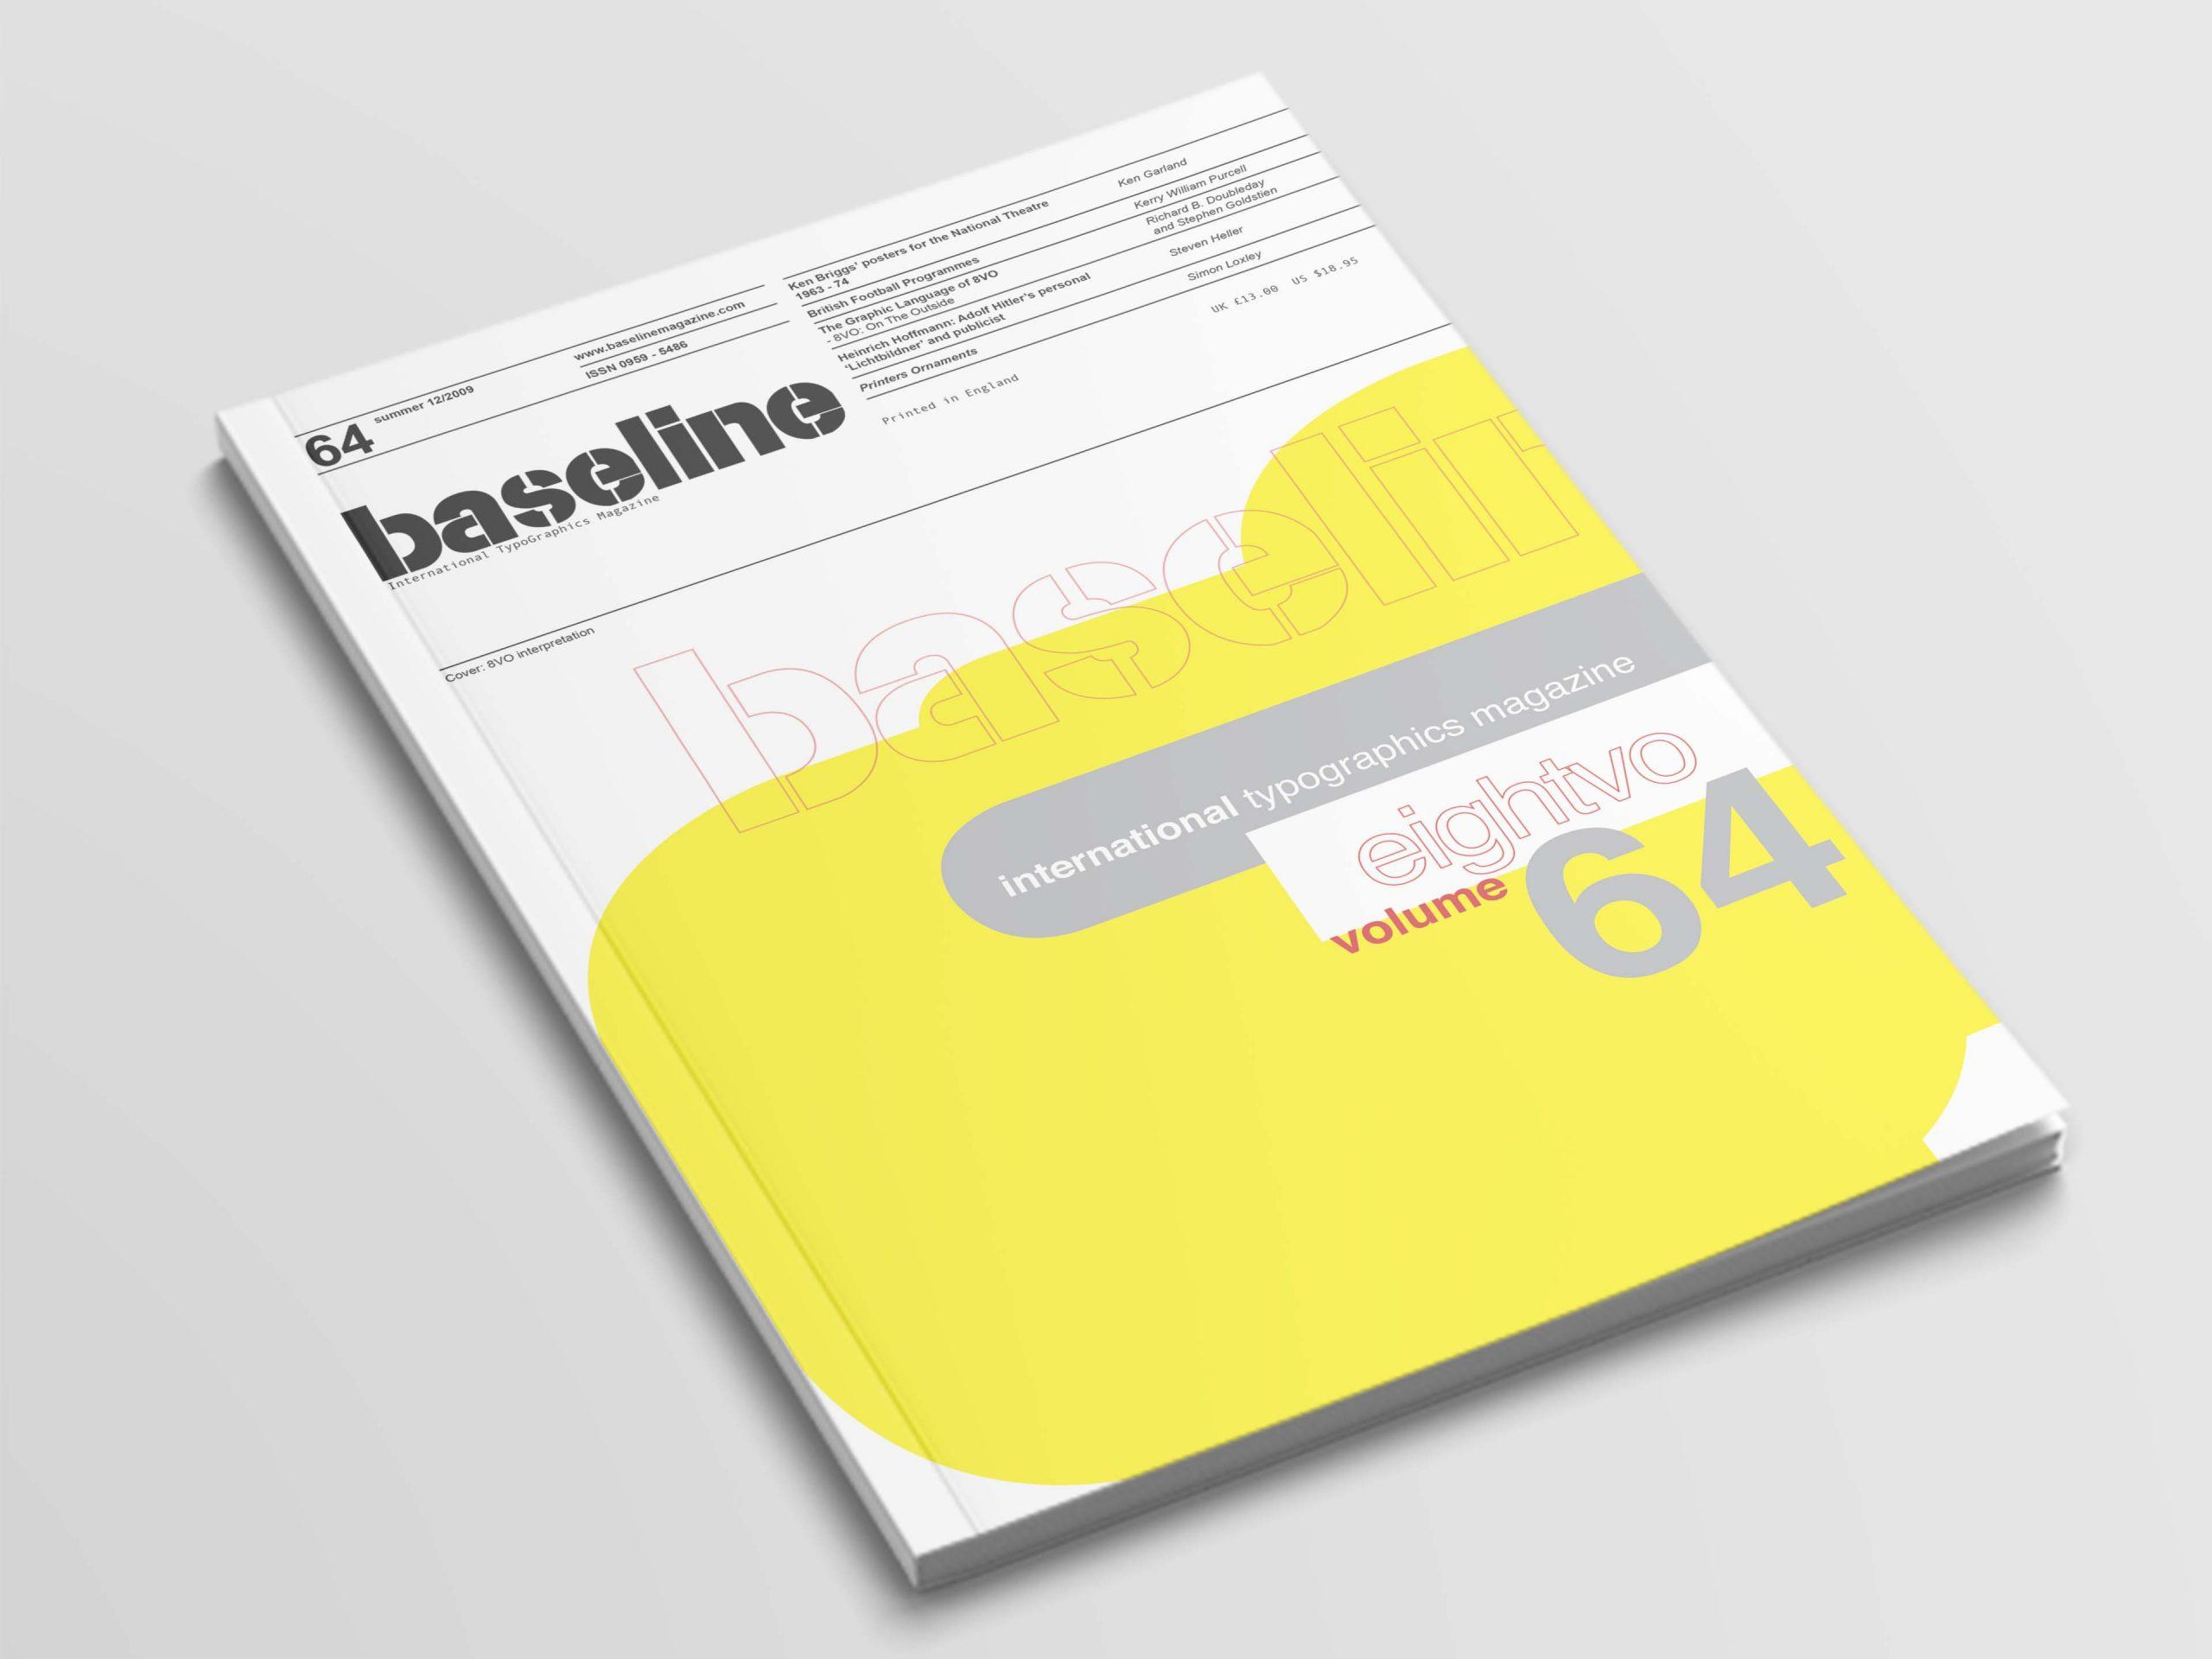 Baseline Magazine Design